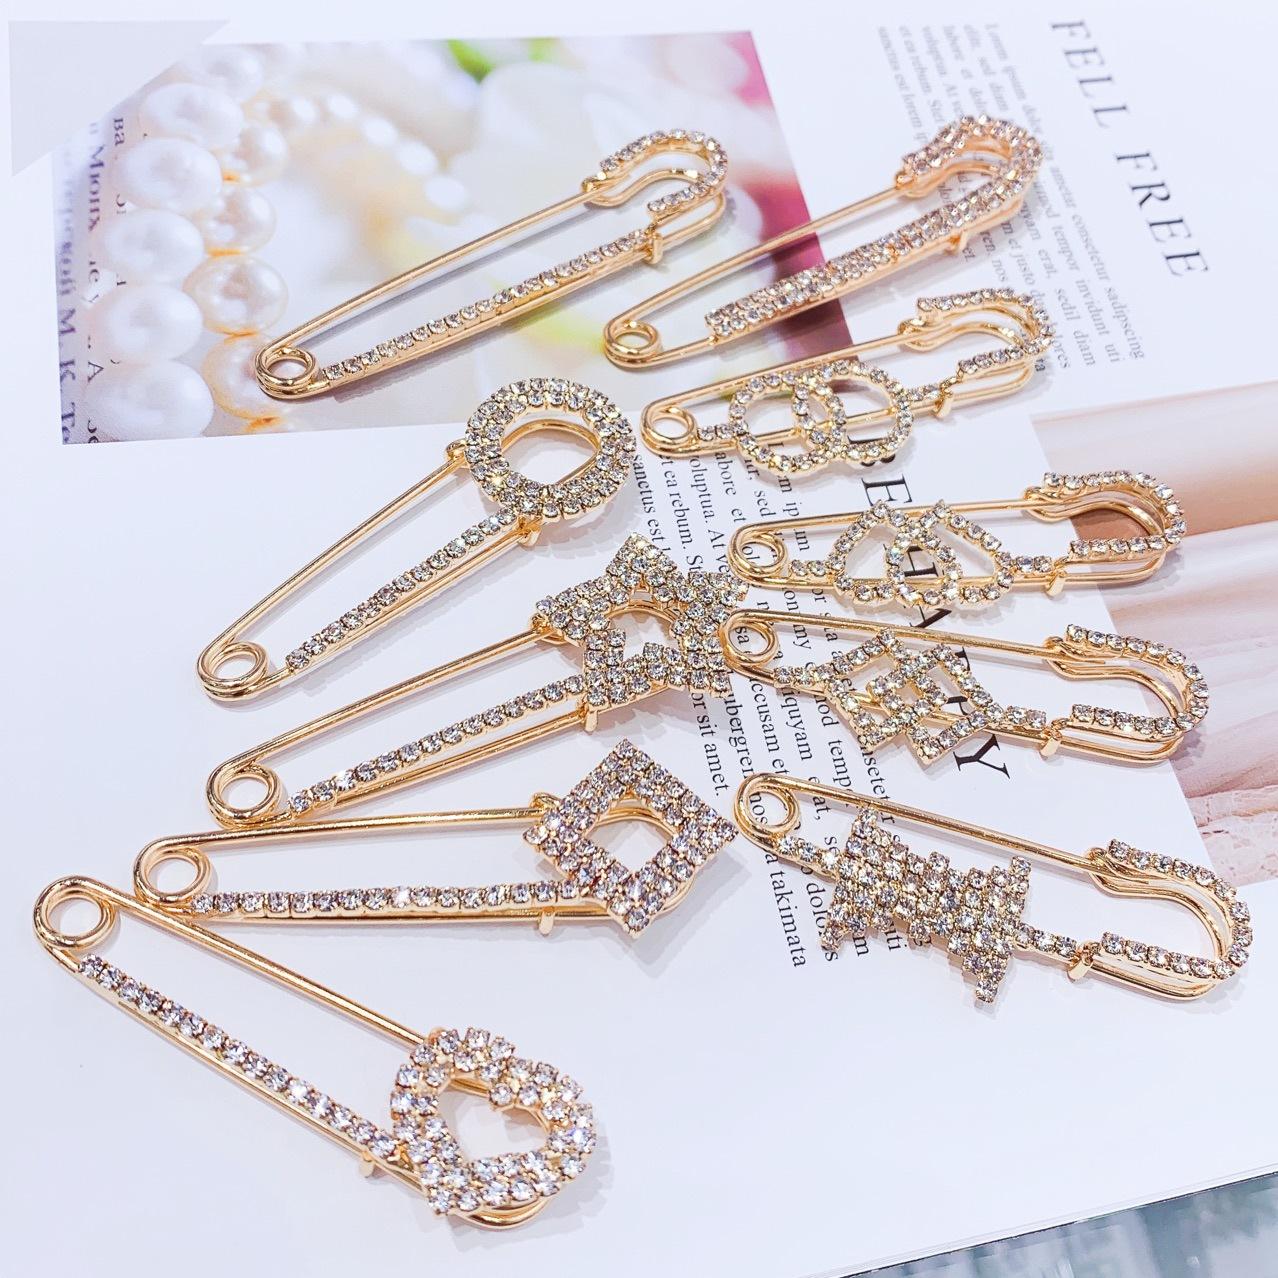 Fresh Rhinestone Brooch womens anti light buckle cardigan small pin alloy love Brooch dress gem accessories inlay